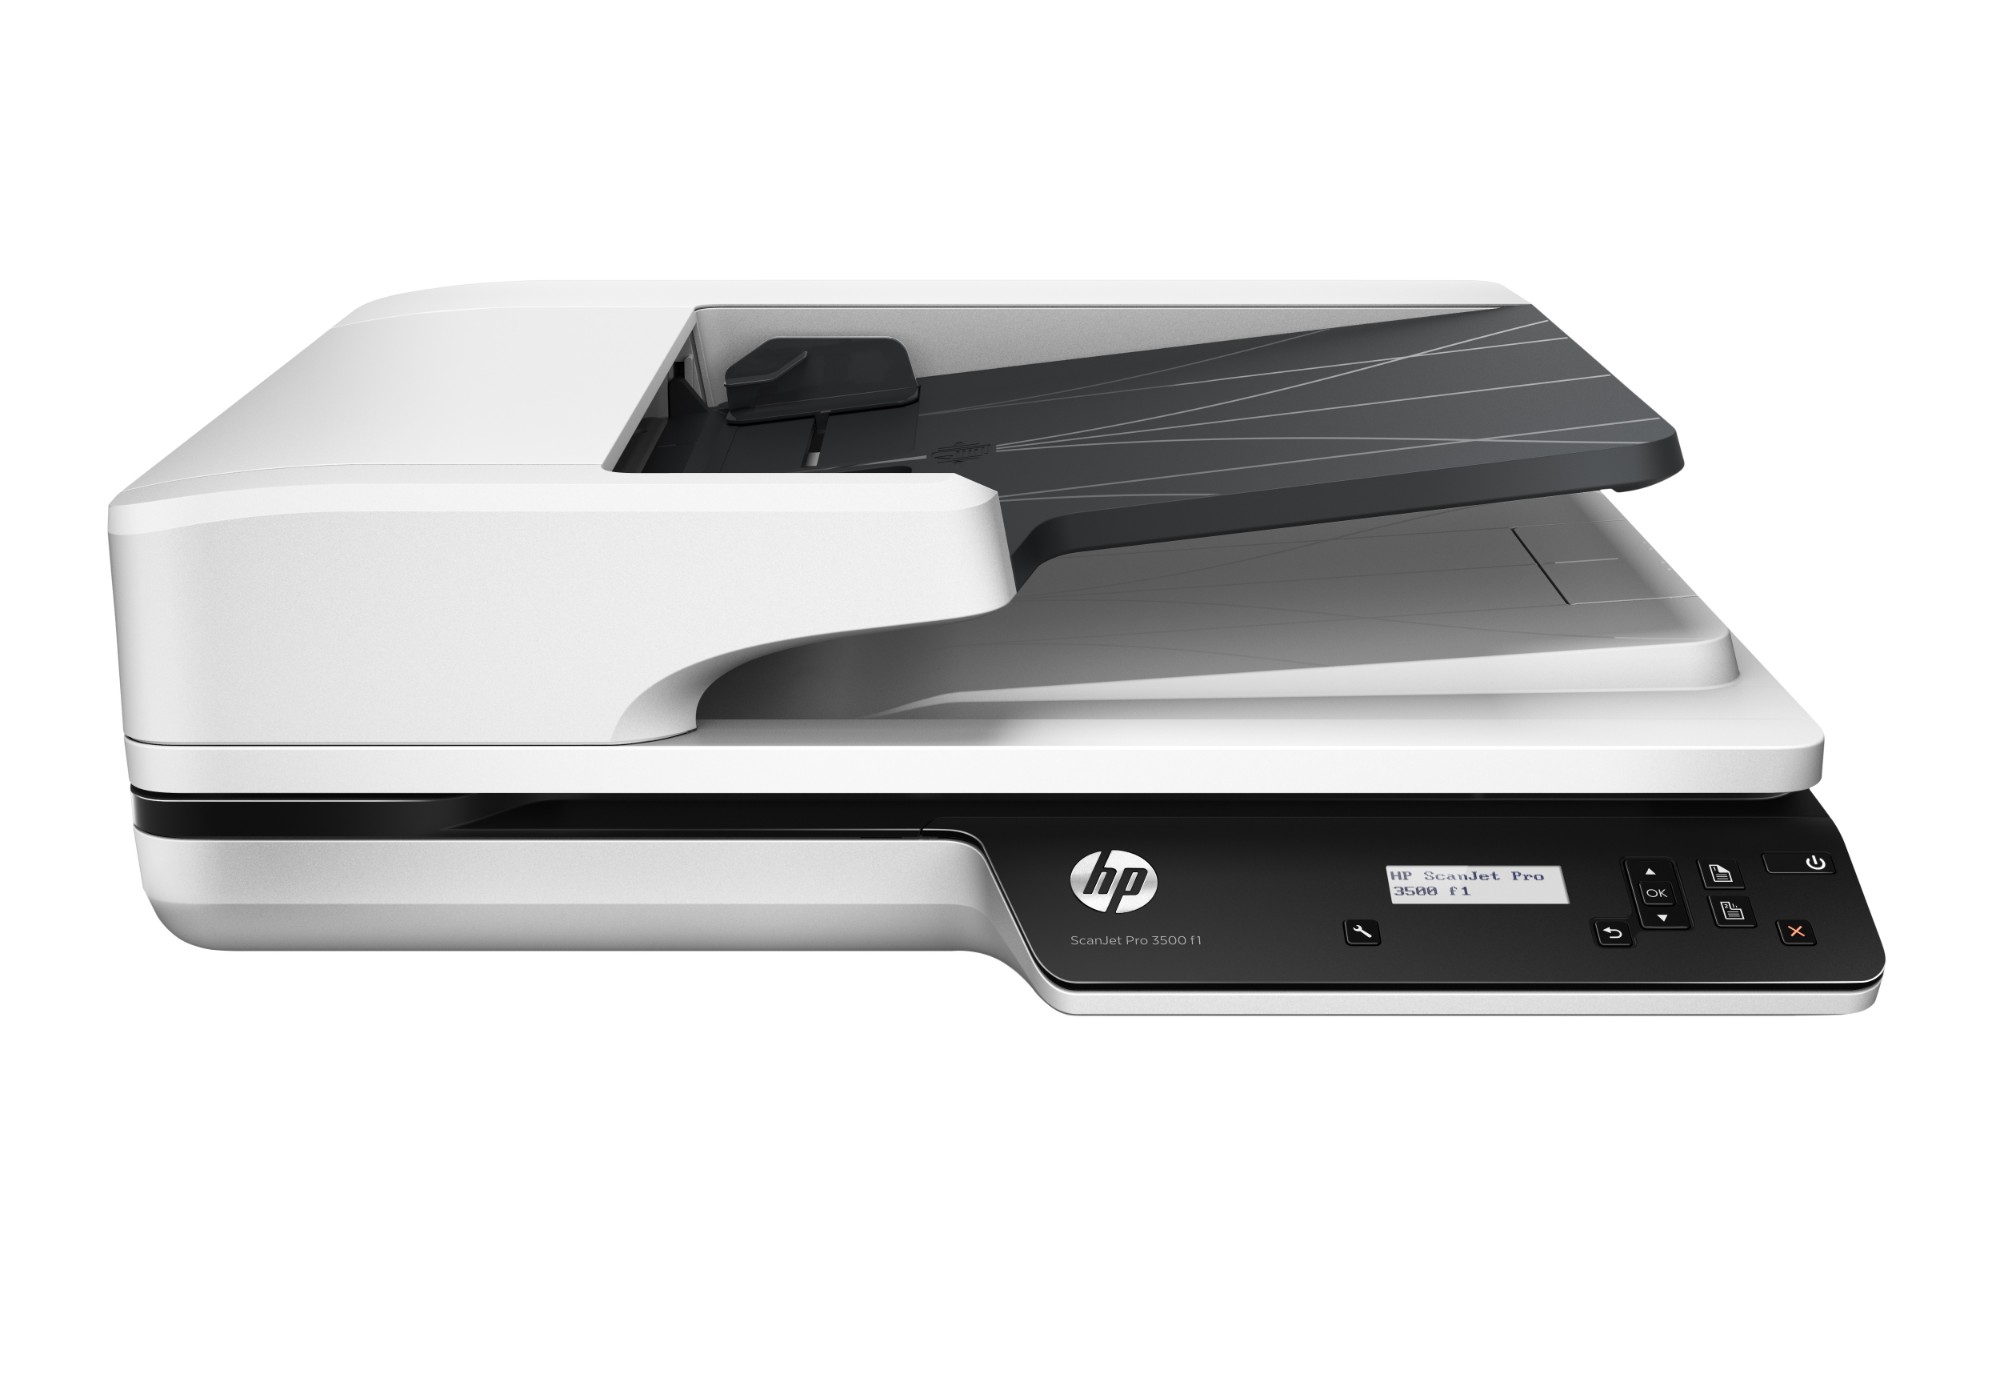 HP Scanjet Pro 3500 f1 1200 x 1200 DPI Escáner de superficie plana y alimentador automático de documentos (ADF) Gris A4